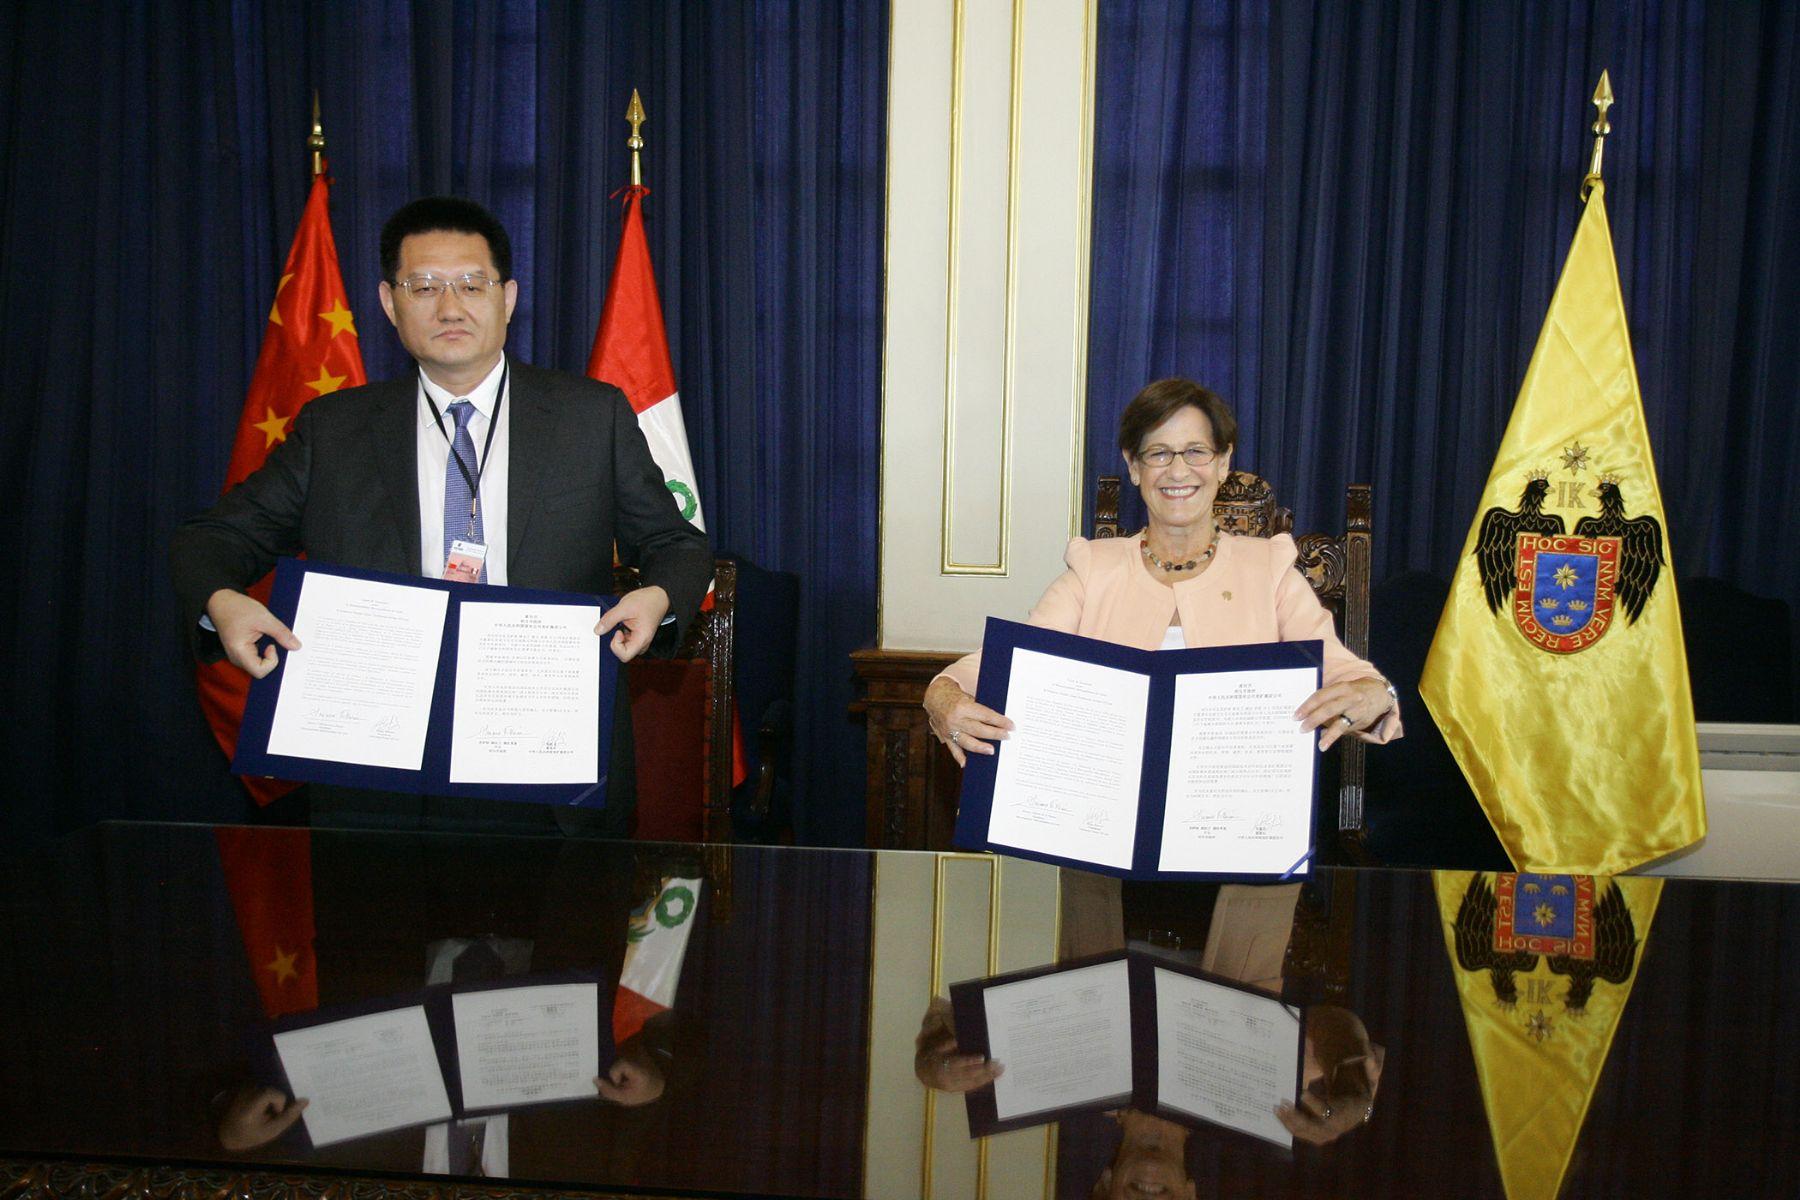 Alcaldesa de Lima Susana Villarán y el presidente de la empresa china Yankuang Group Co.Ltd, Zhang Xinwen. ANDINA/Difusión